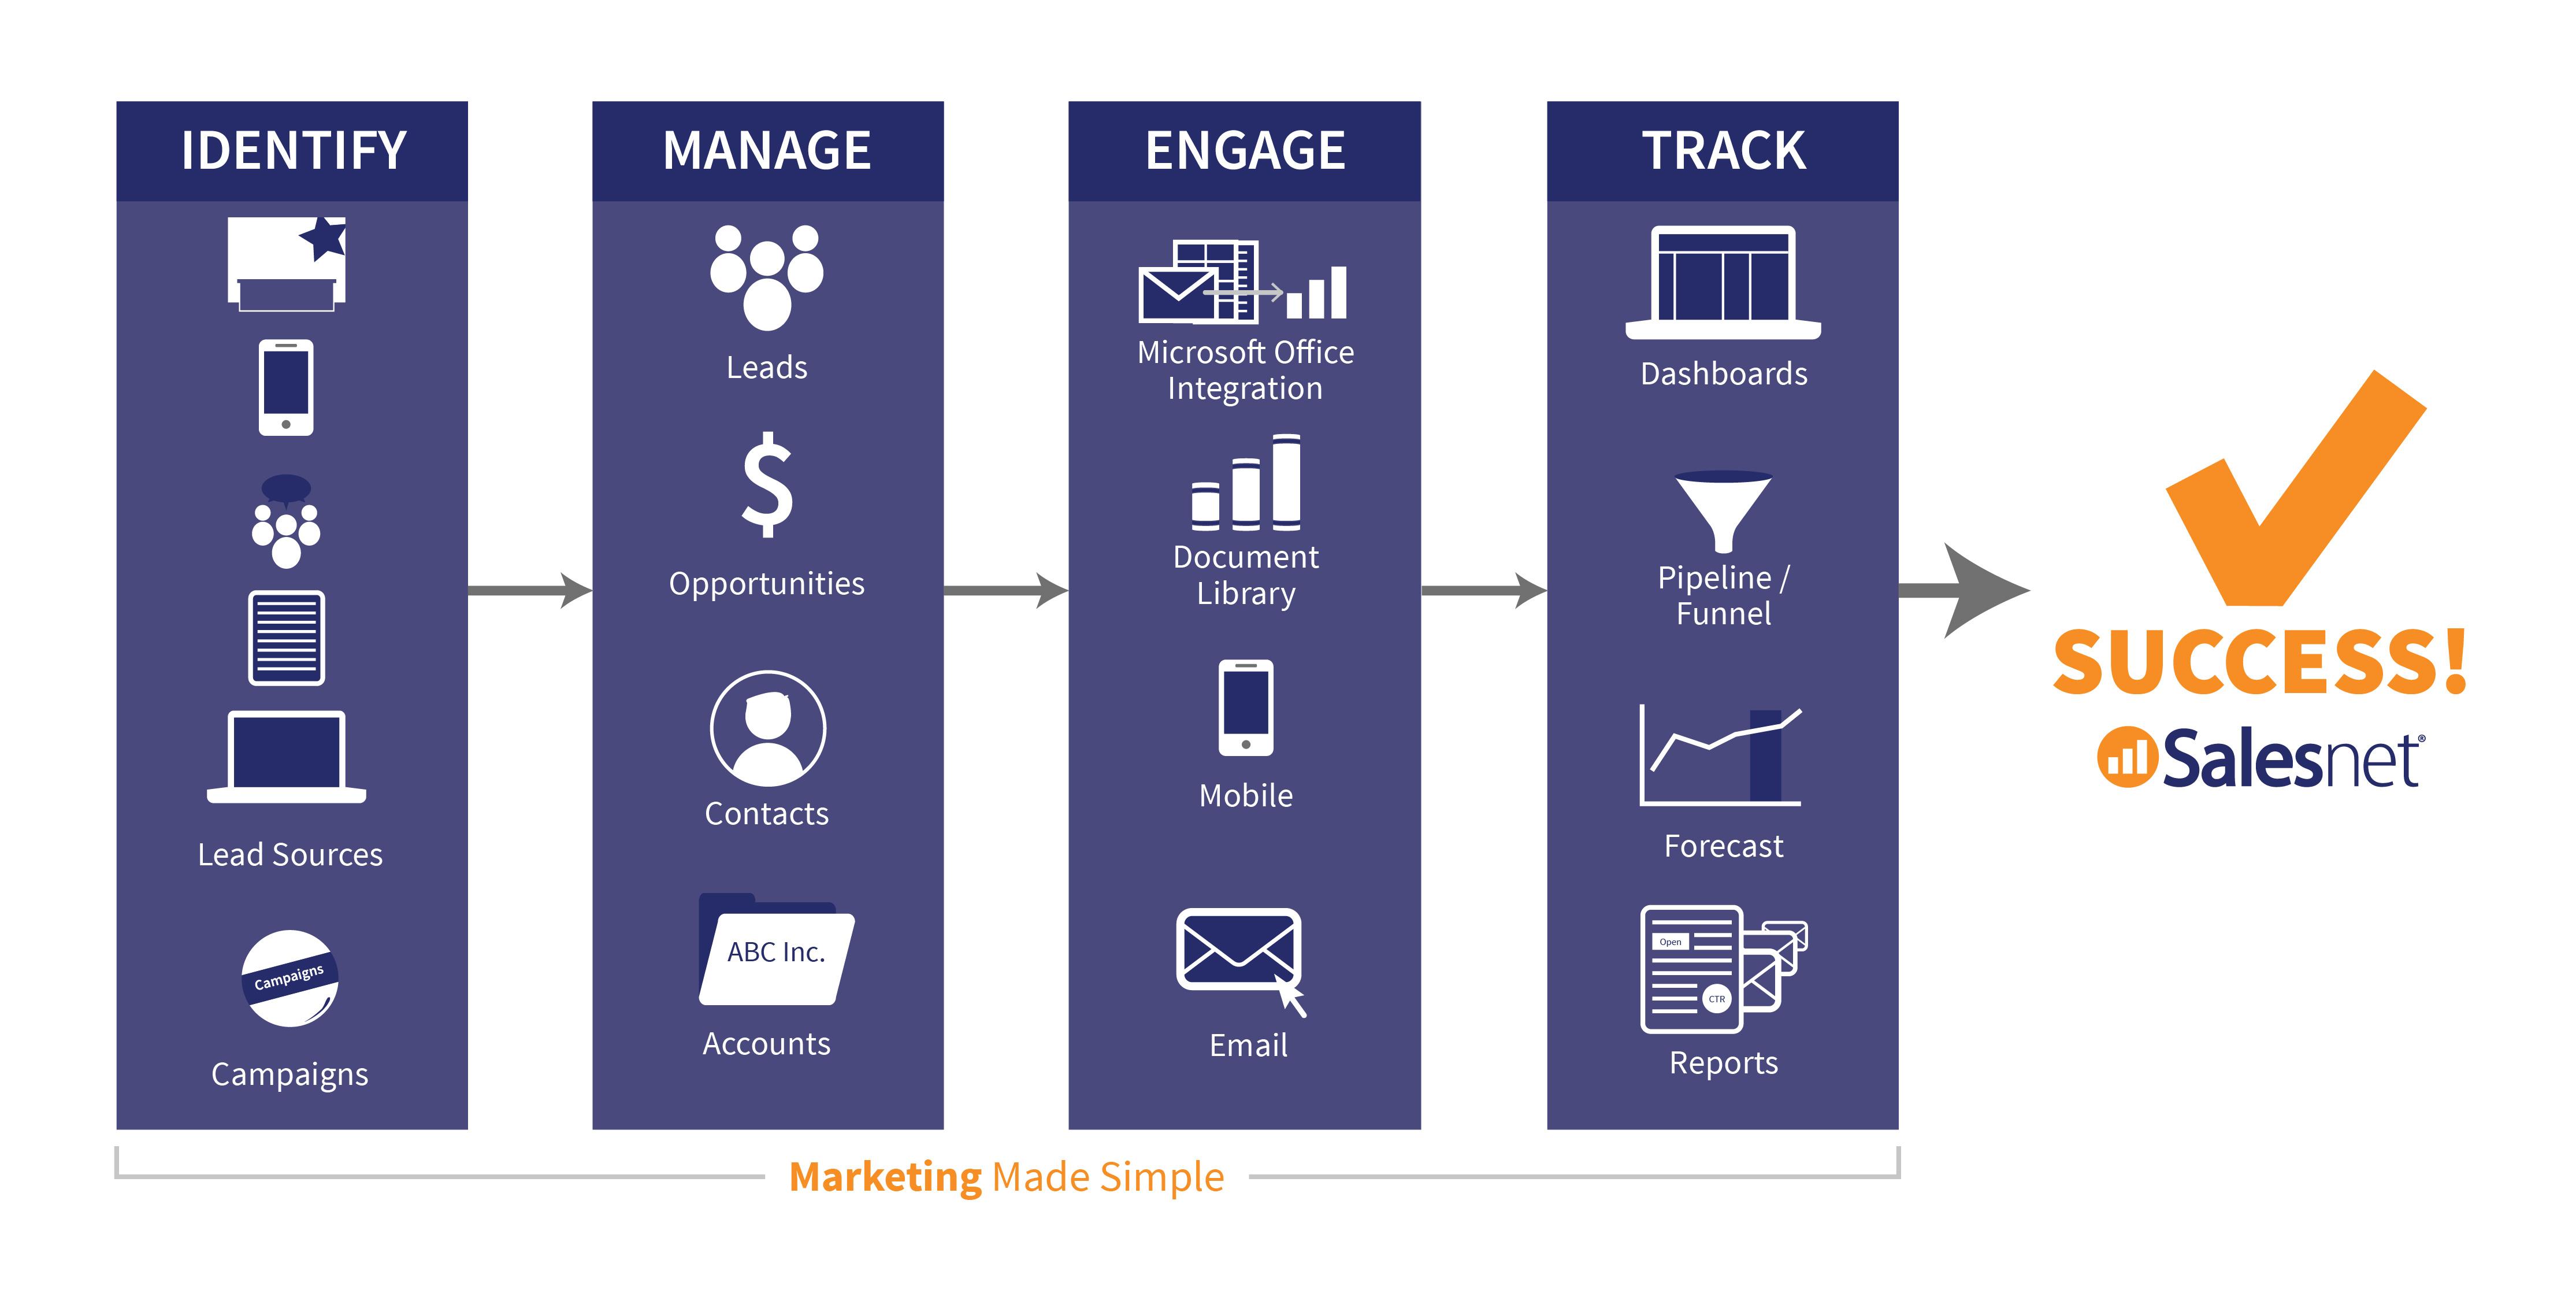 Salesnet Demo - Marketing Made Simple